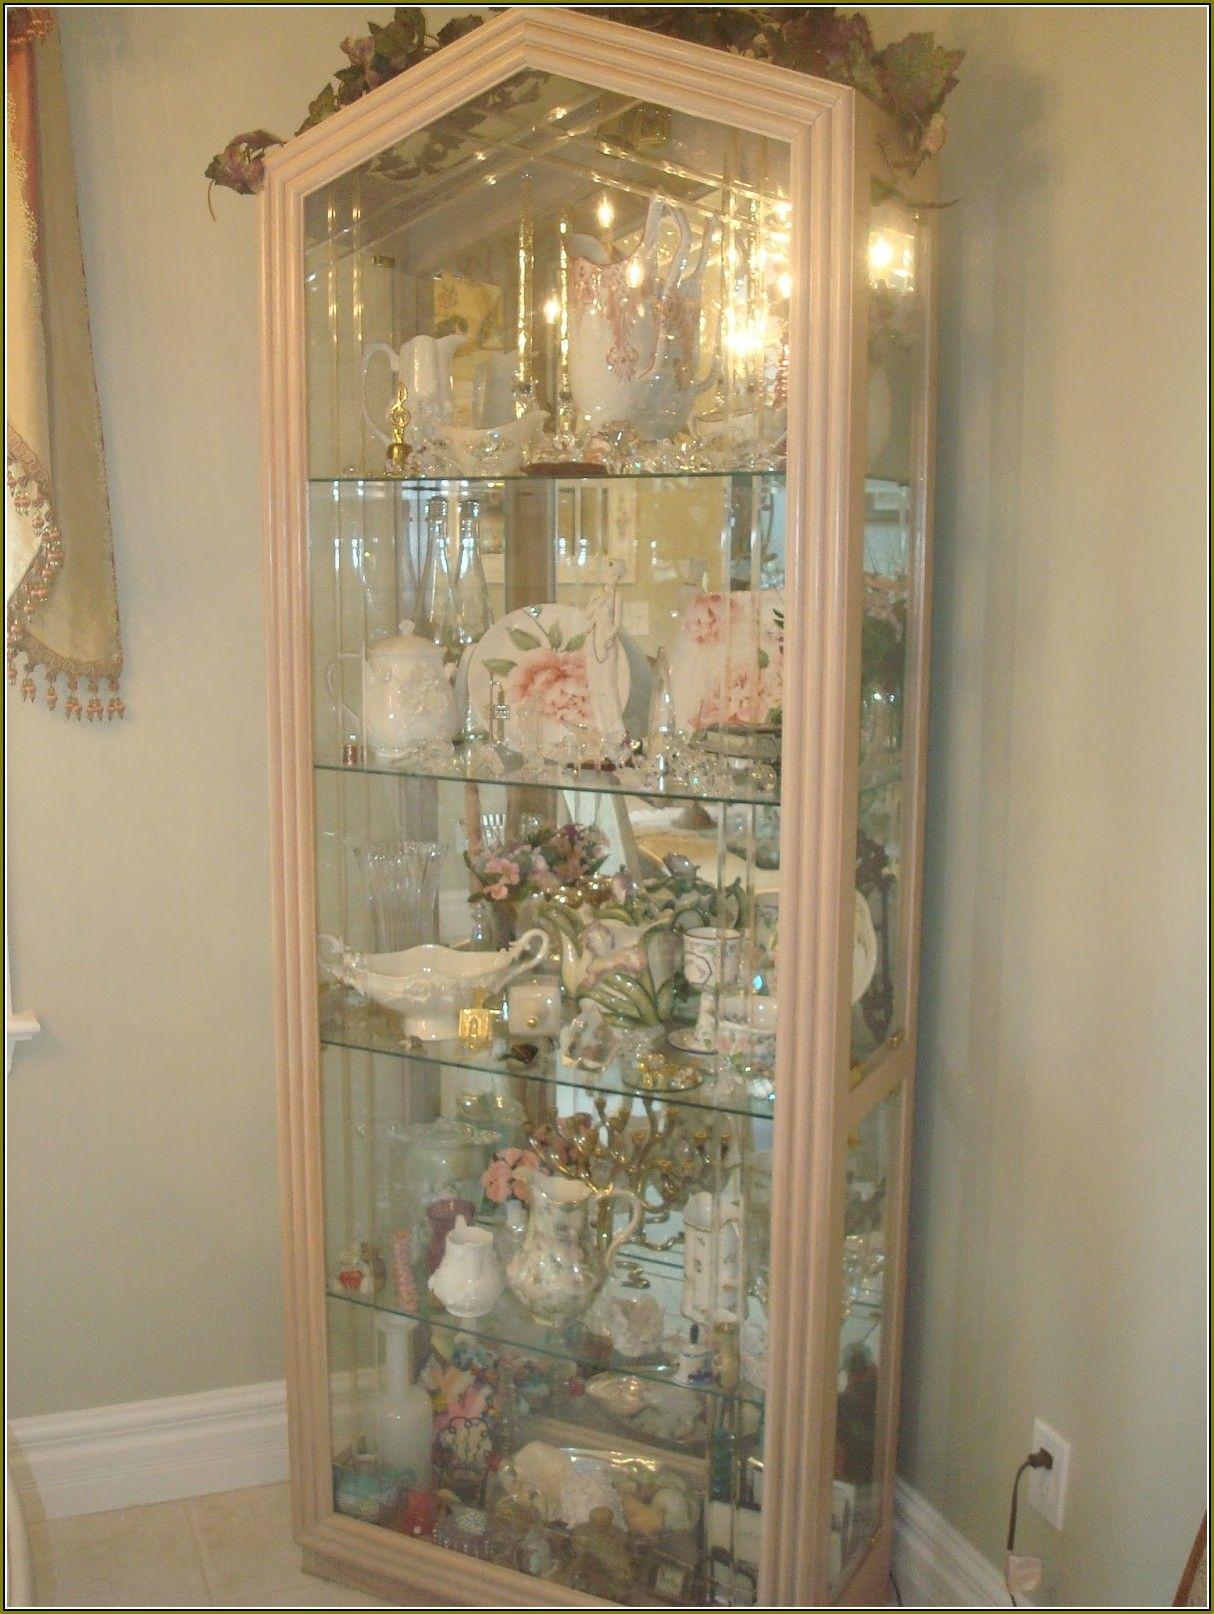 Delightful White Curio Cabinet Glass Doors (1214×1614)